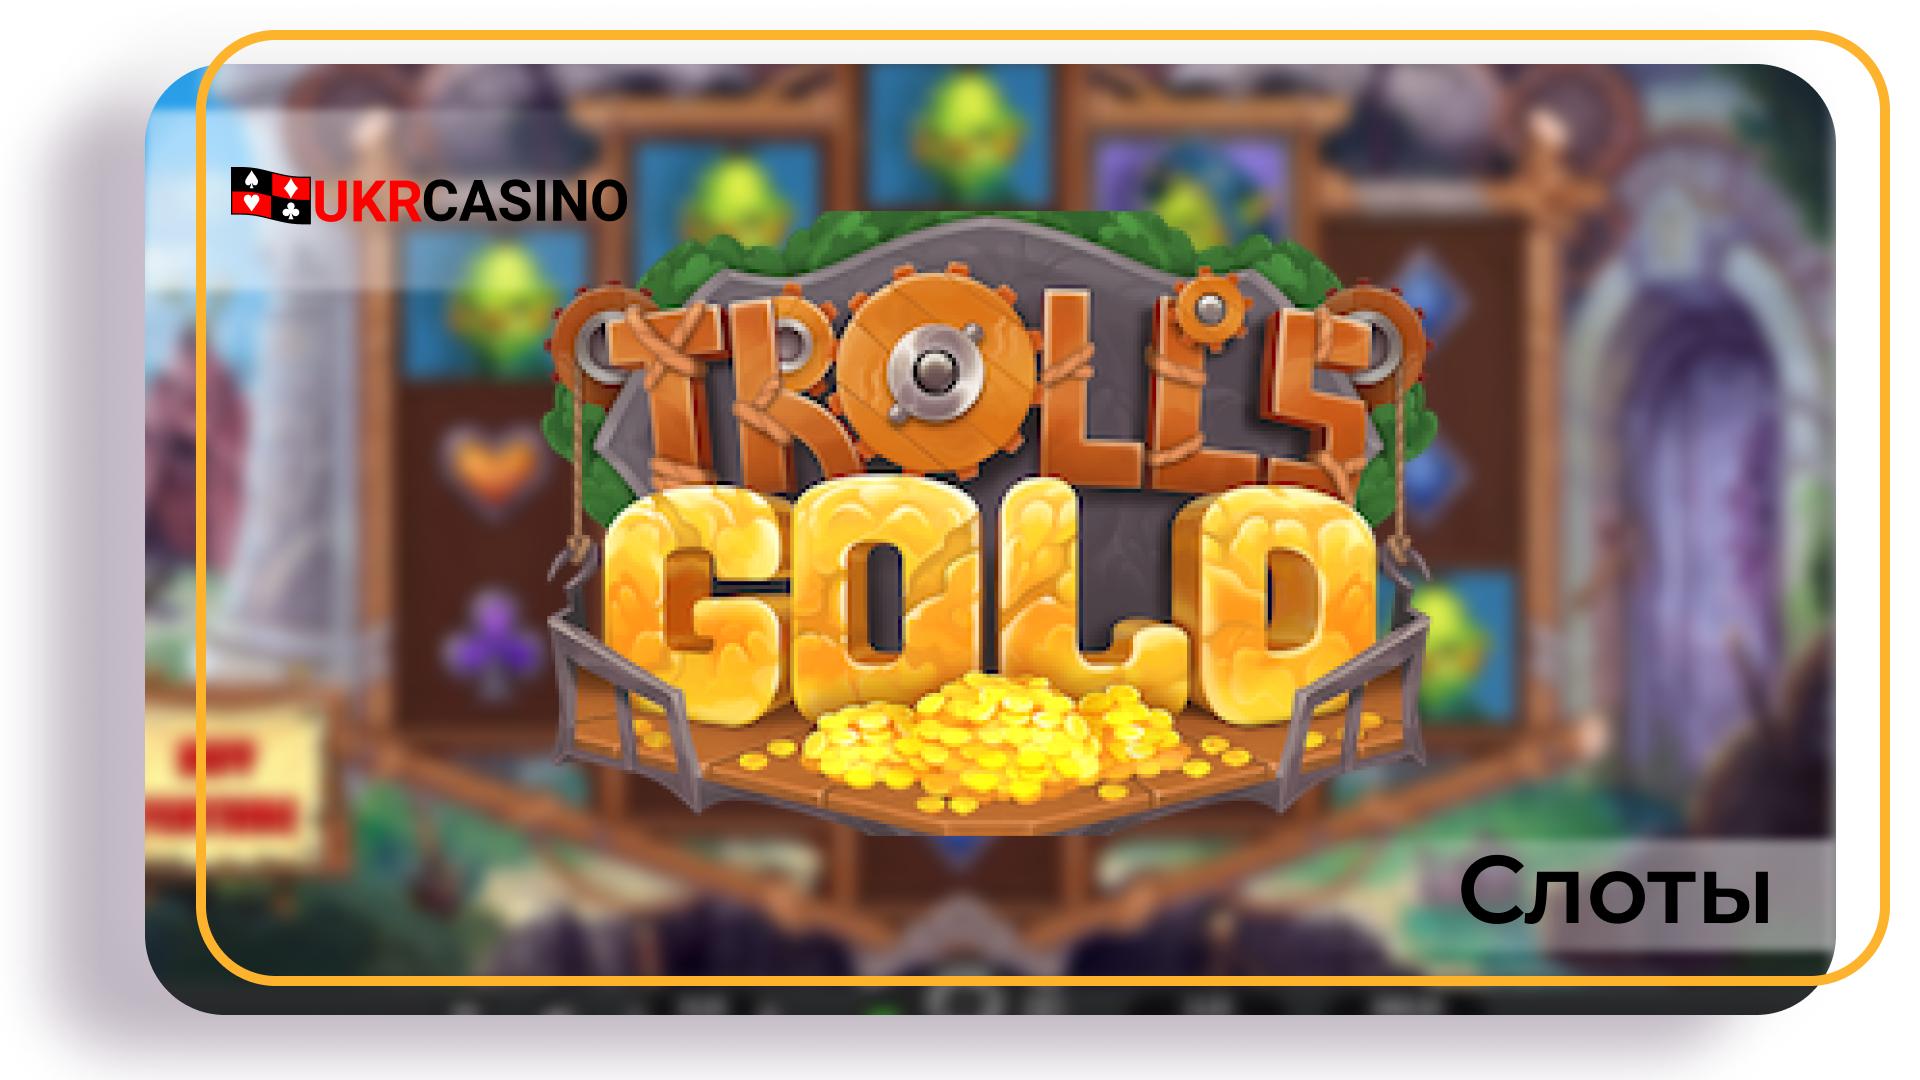 Trolls Gold - Relax Gaming